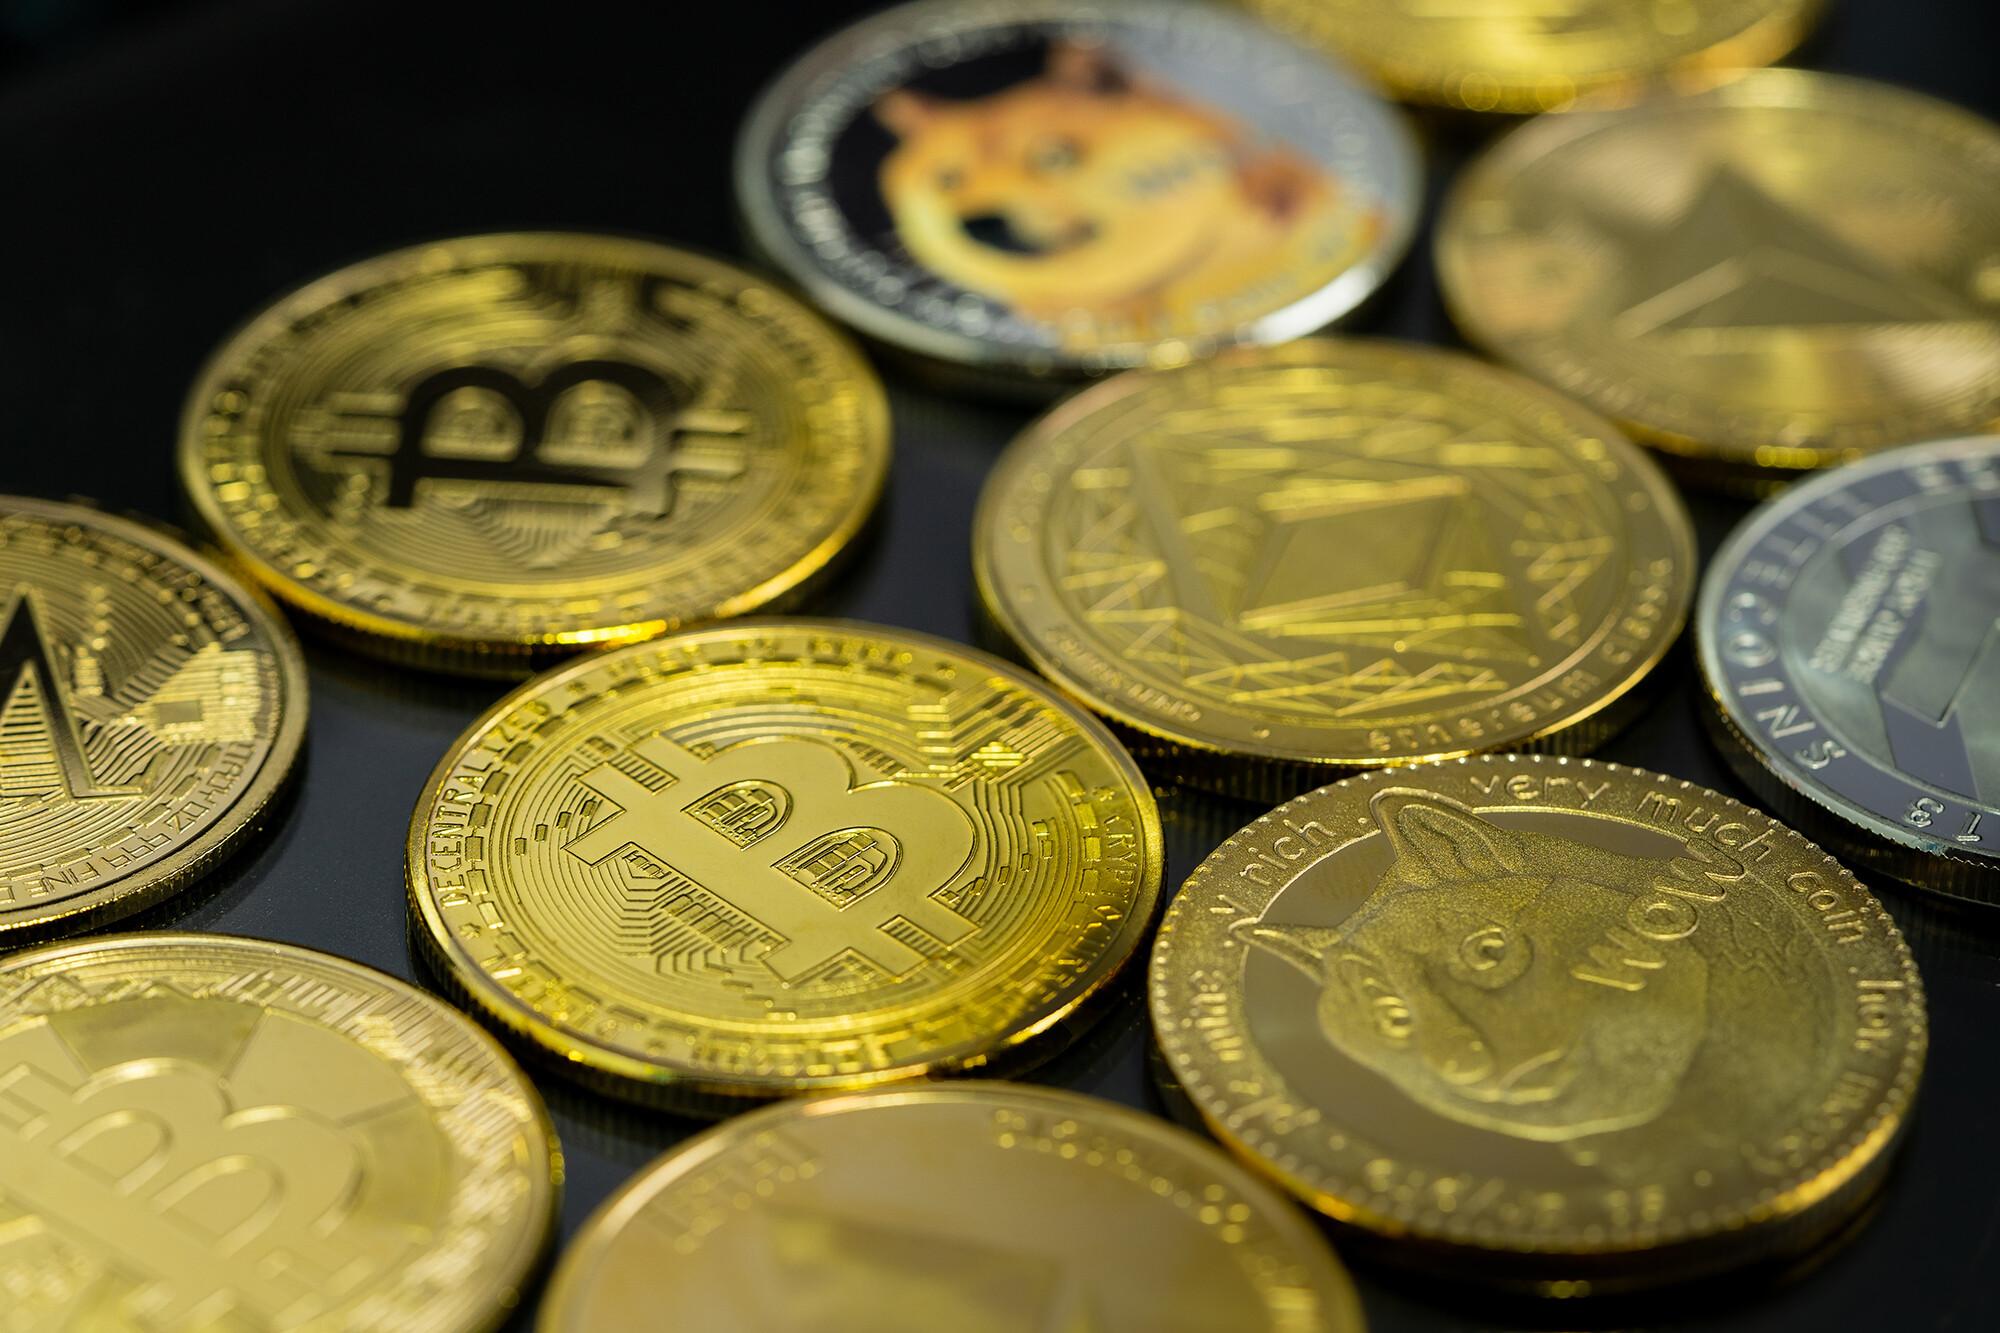 Amazon posted a crypto job. Bitcoin surged 14%